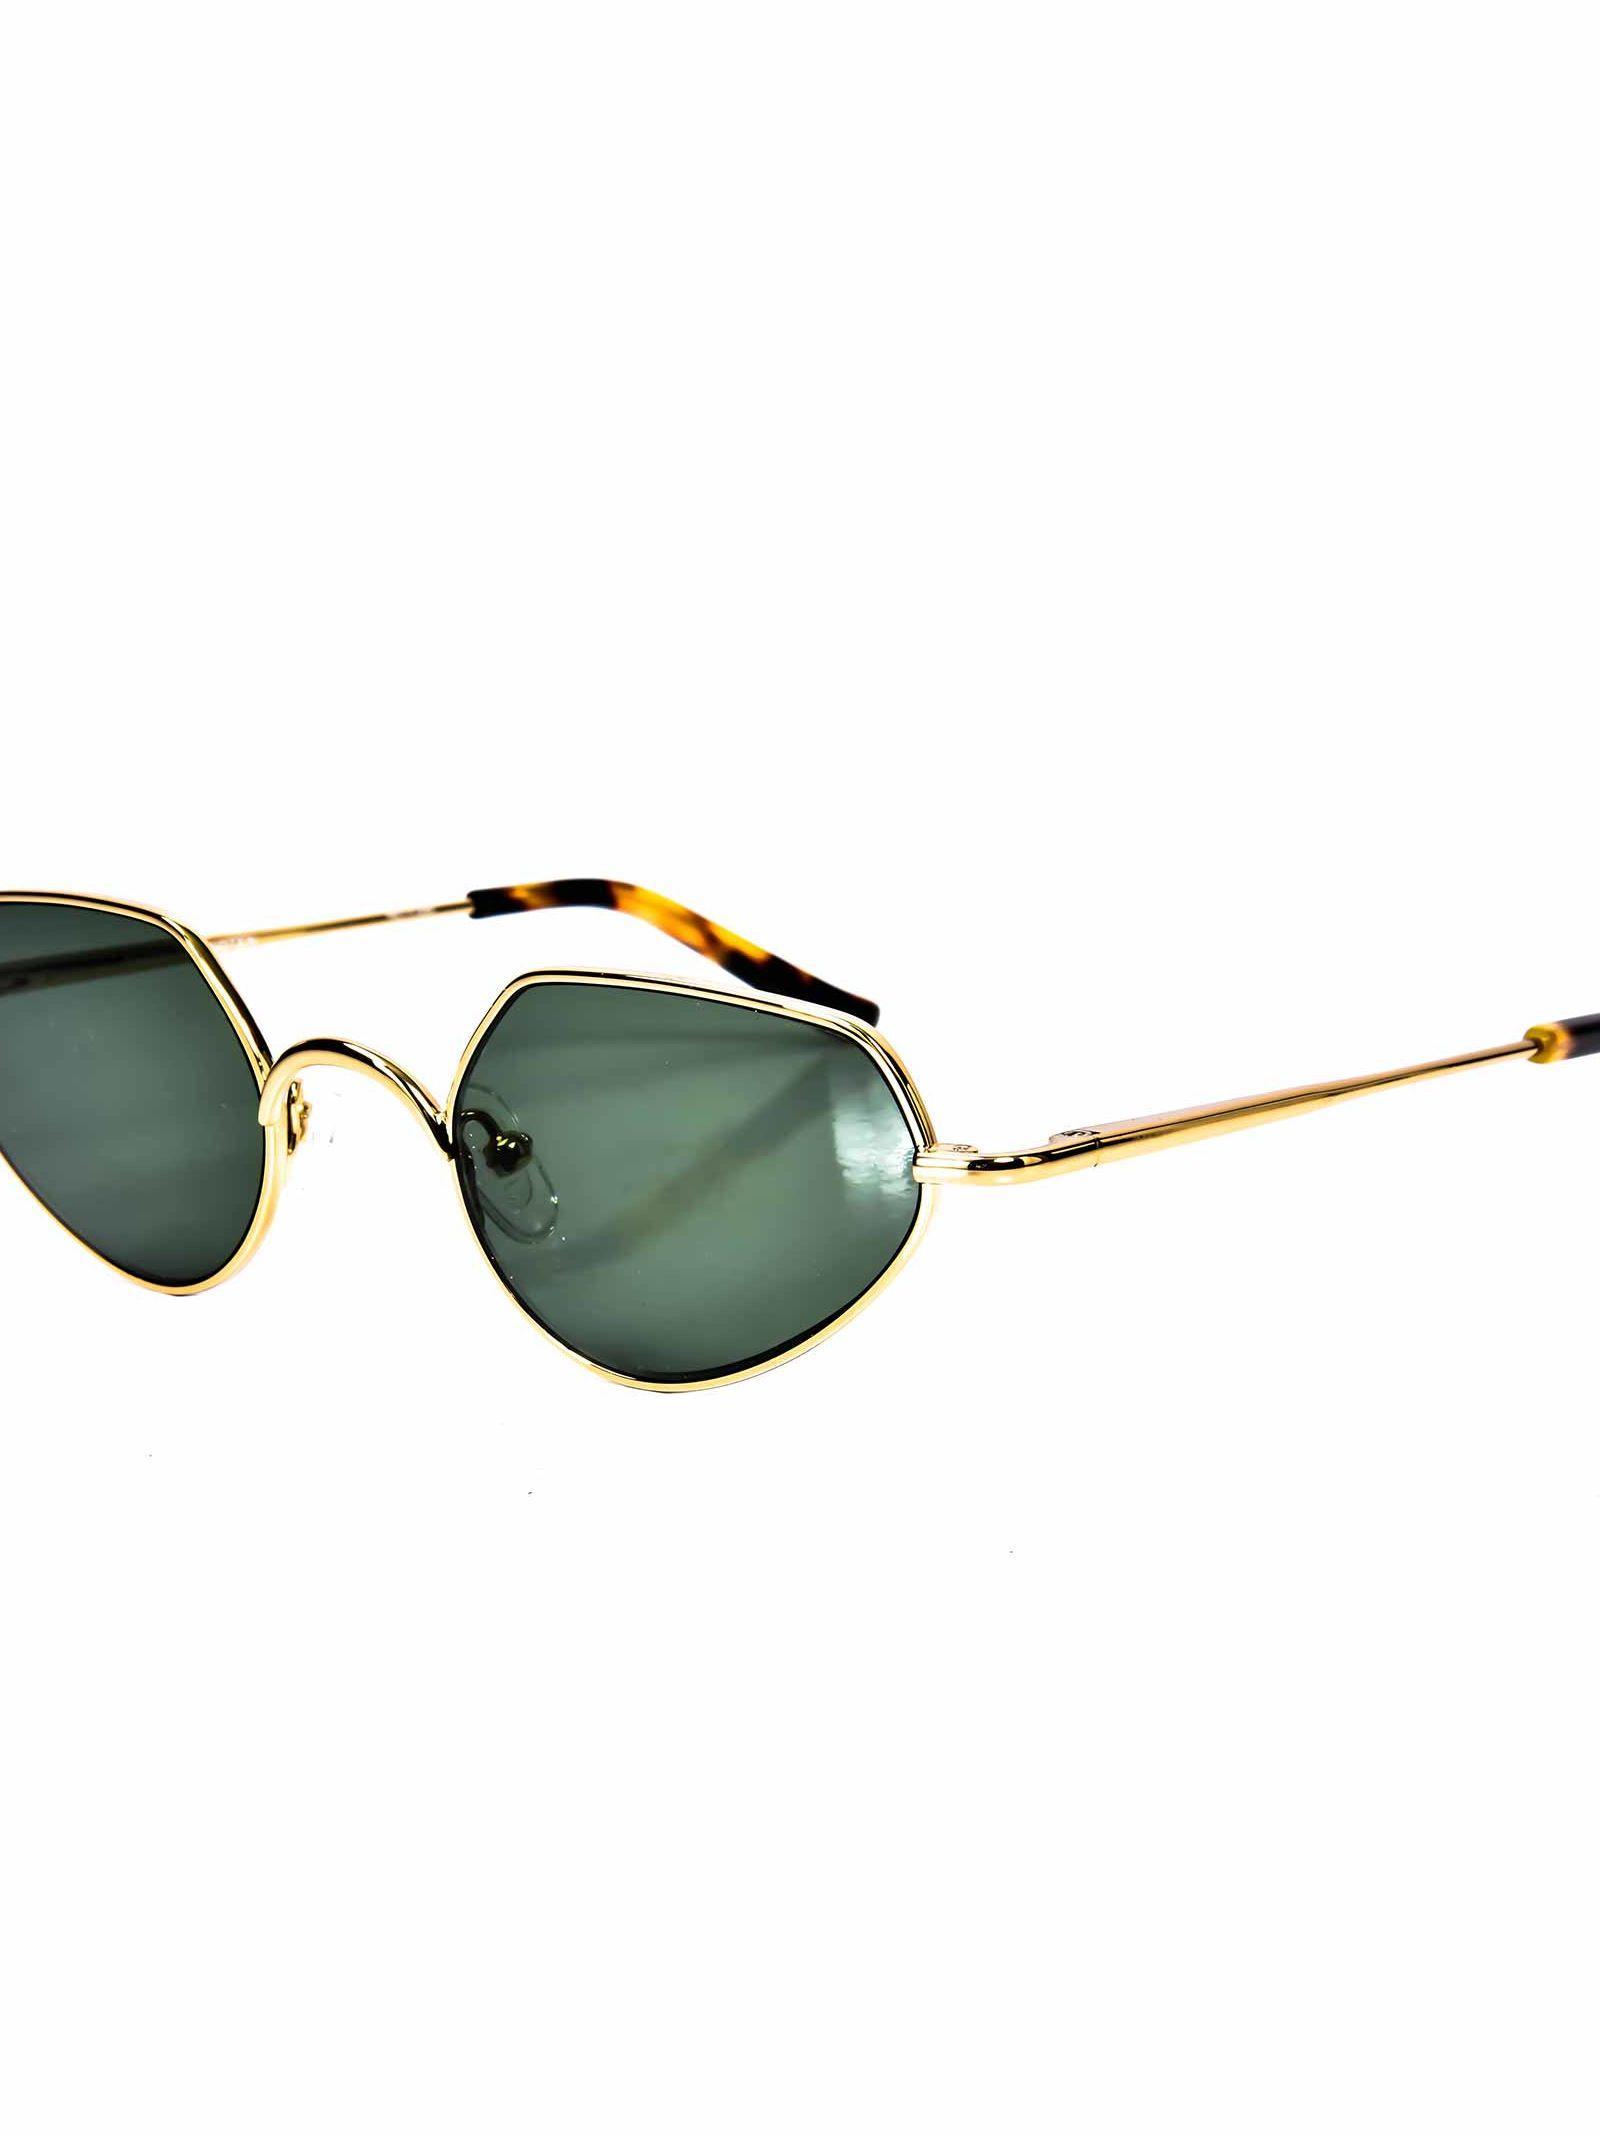 128a6fe8a416 Linda Farrow Dries Van Noten Sunglasses In Cyellow Gold